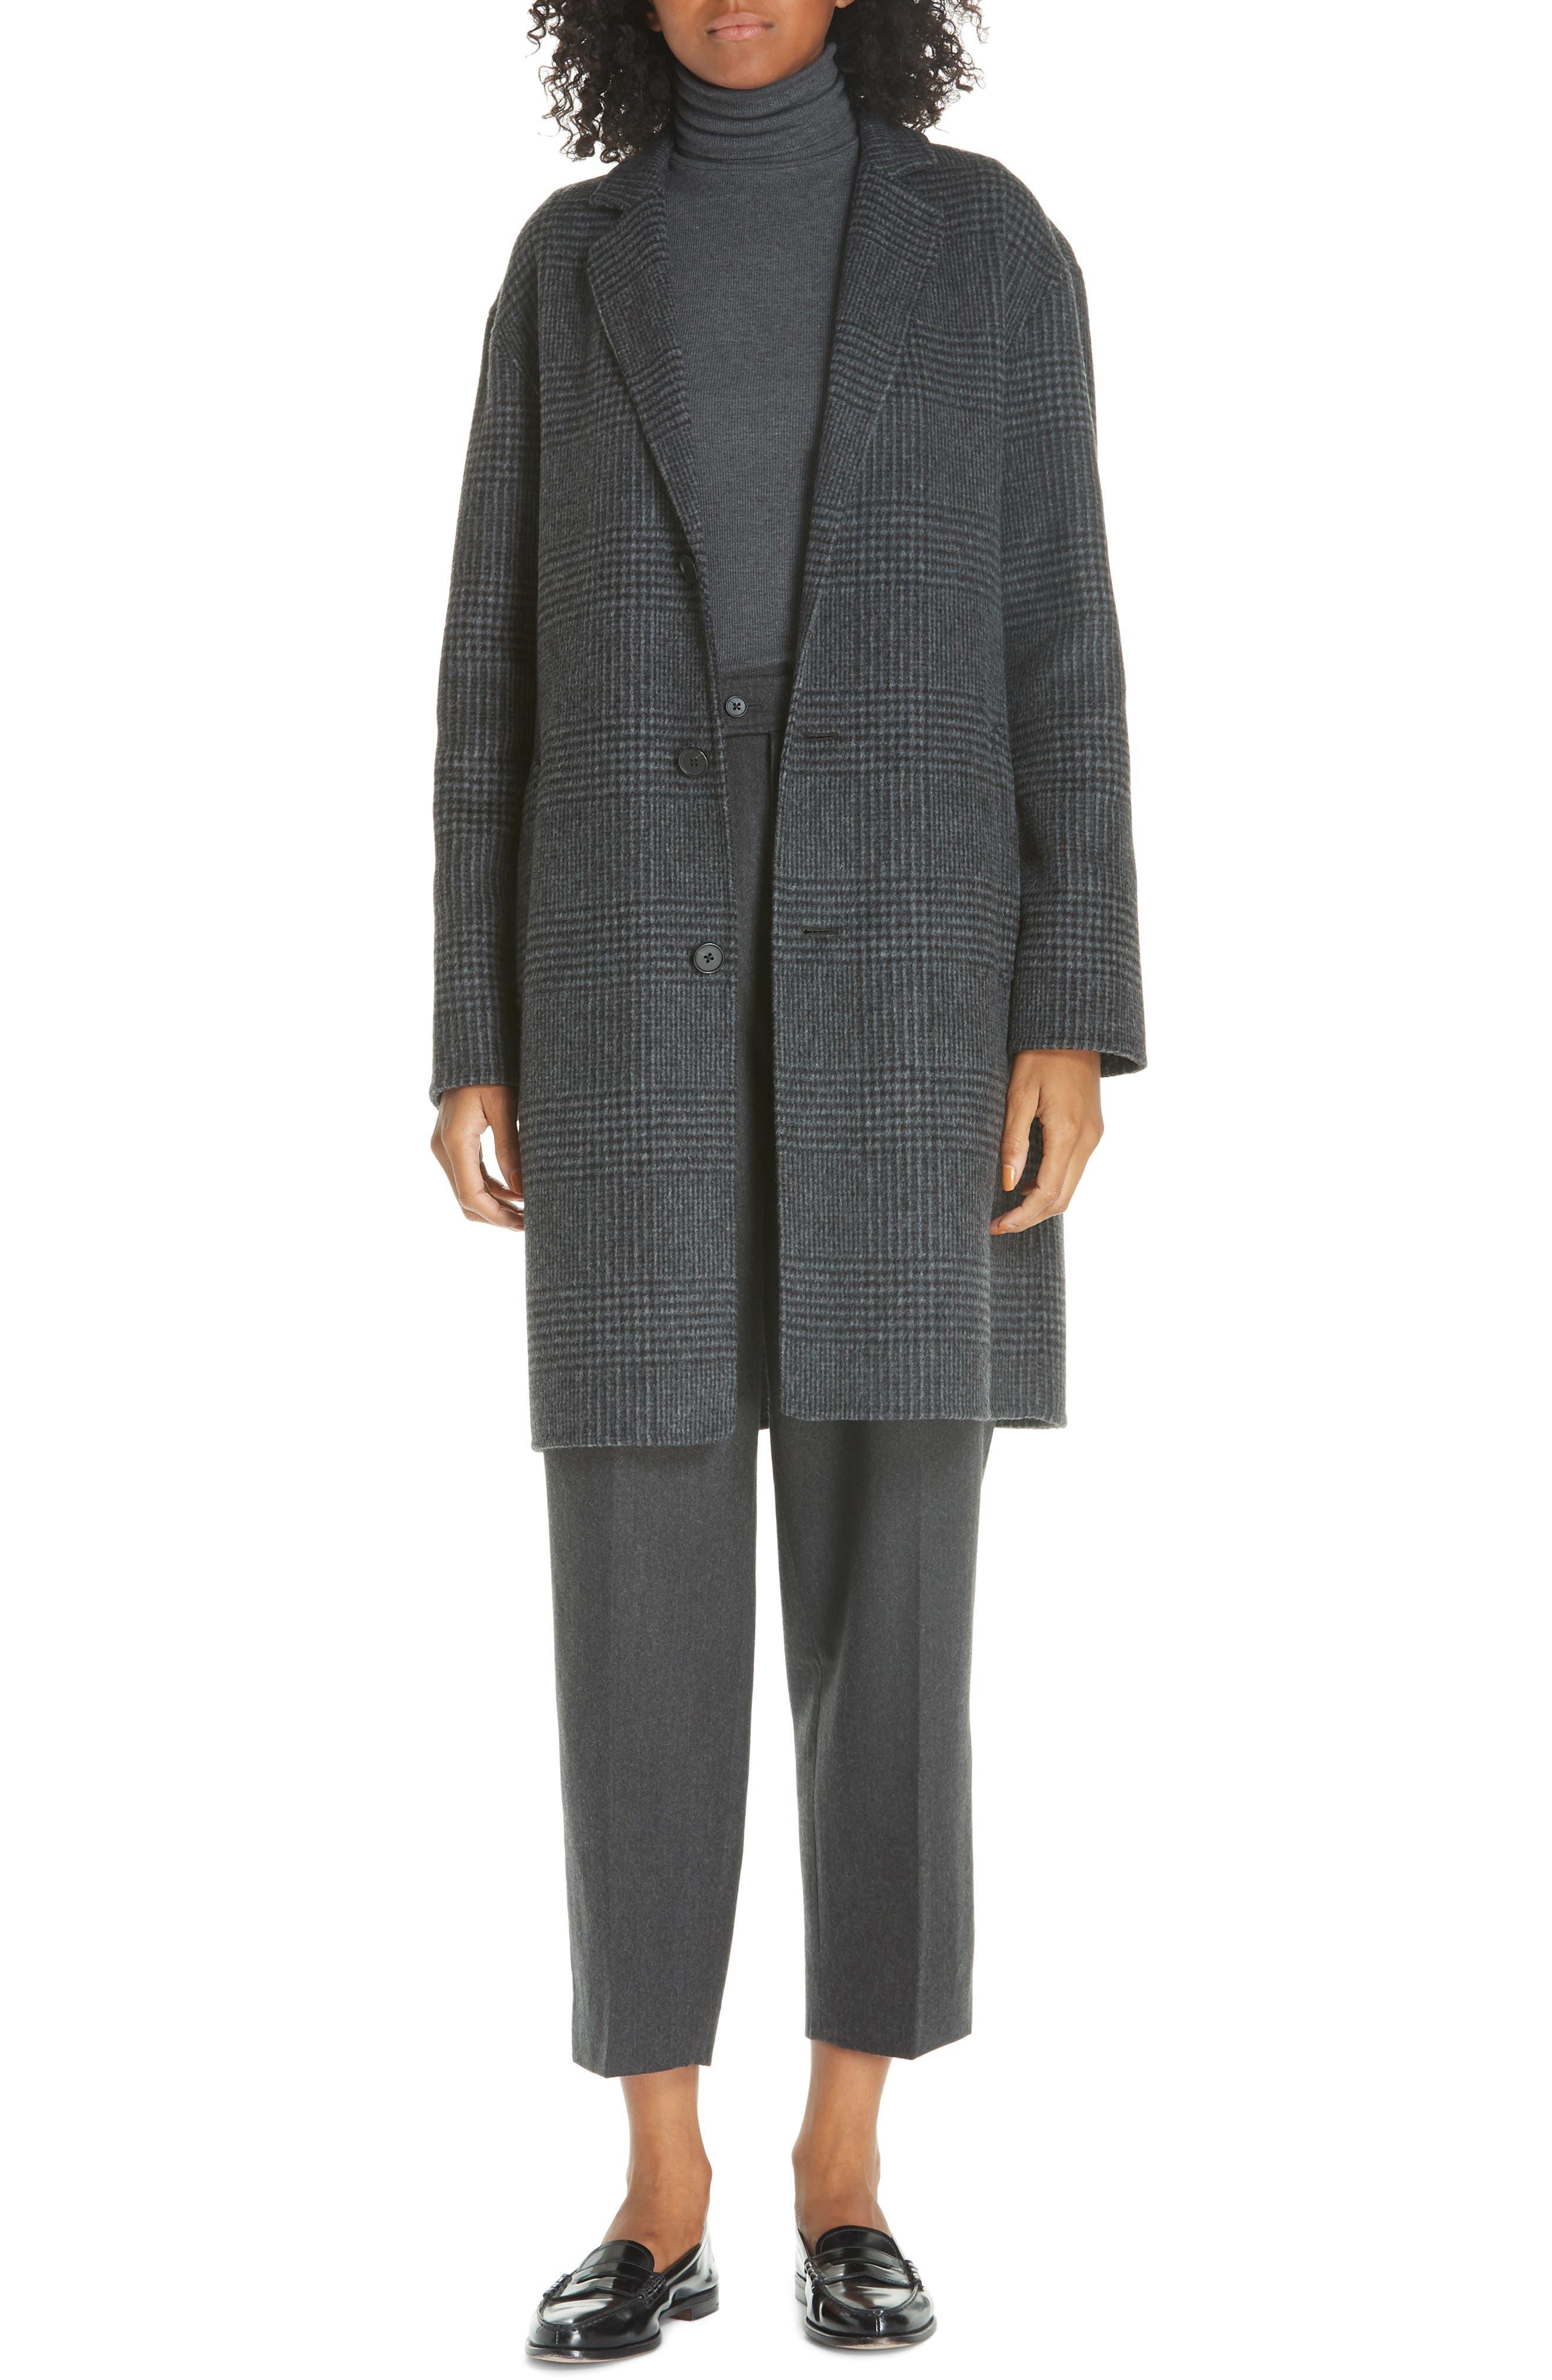 Plaid Wool Blend Coat,                             Alternate thumbnail 7, color,                             CHARCOAL GLEN PLAID